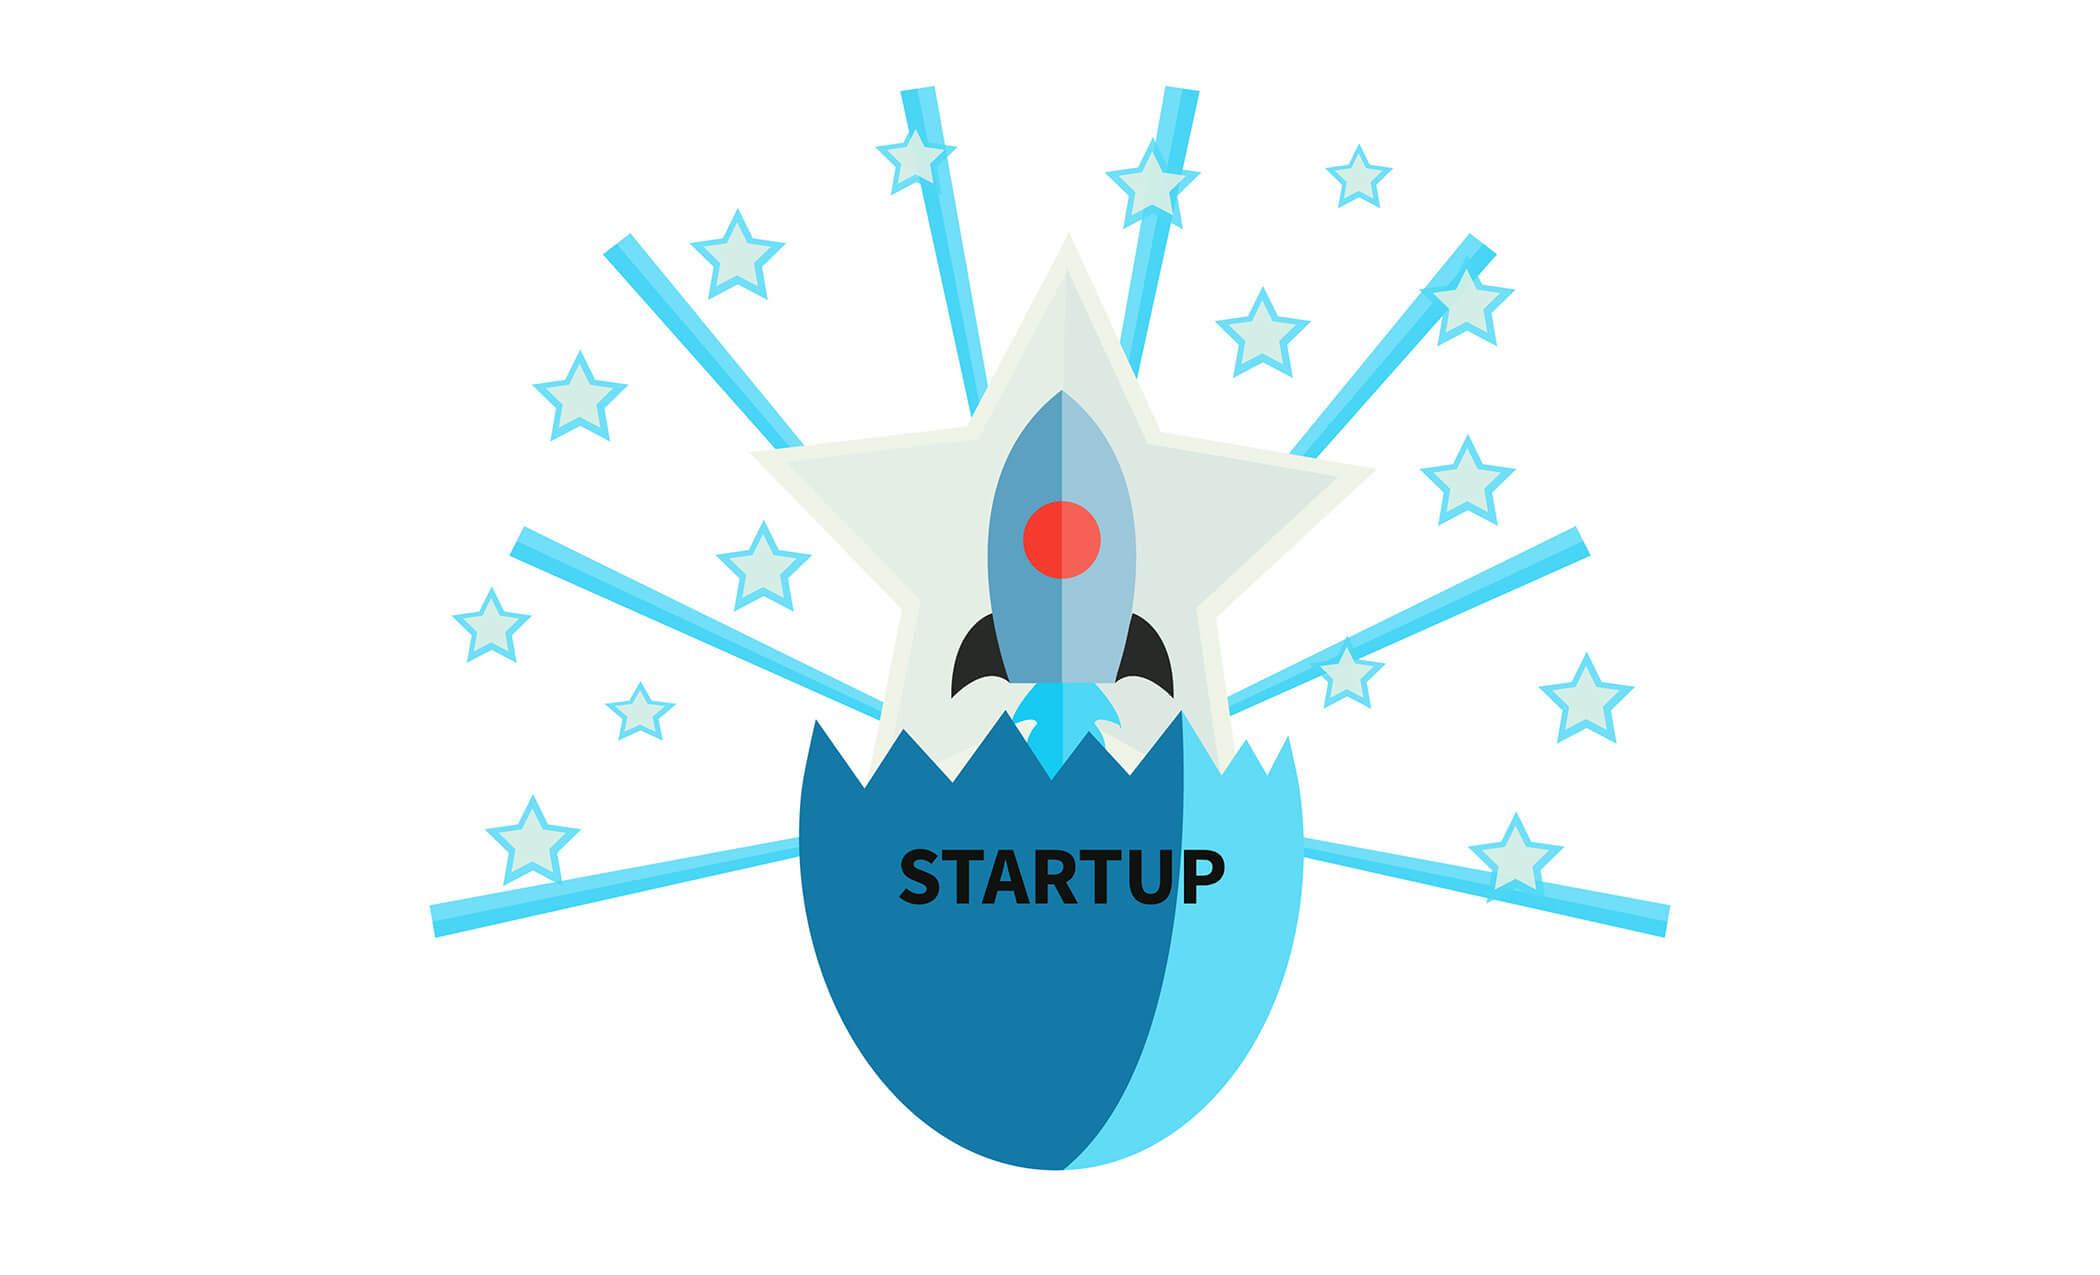 Founders' Series: Incubate or Accelerate?